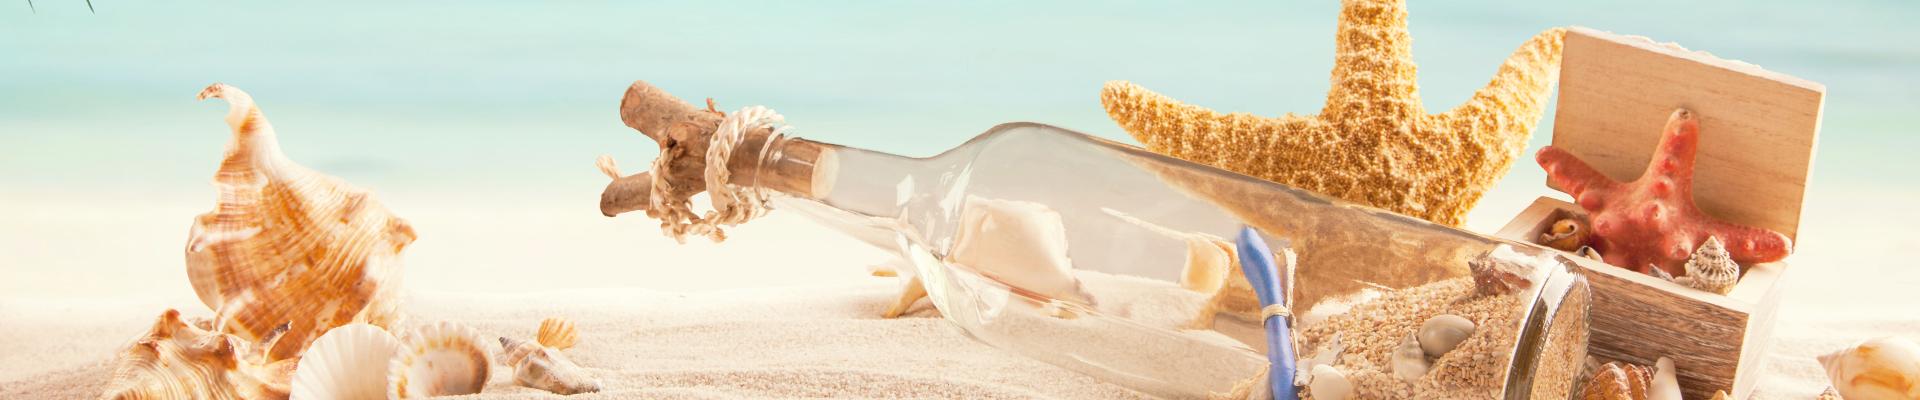 bigstock-Sandy-tropical-beach-with-palm-133049543x